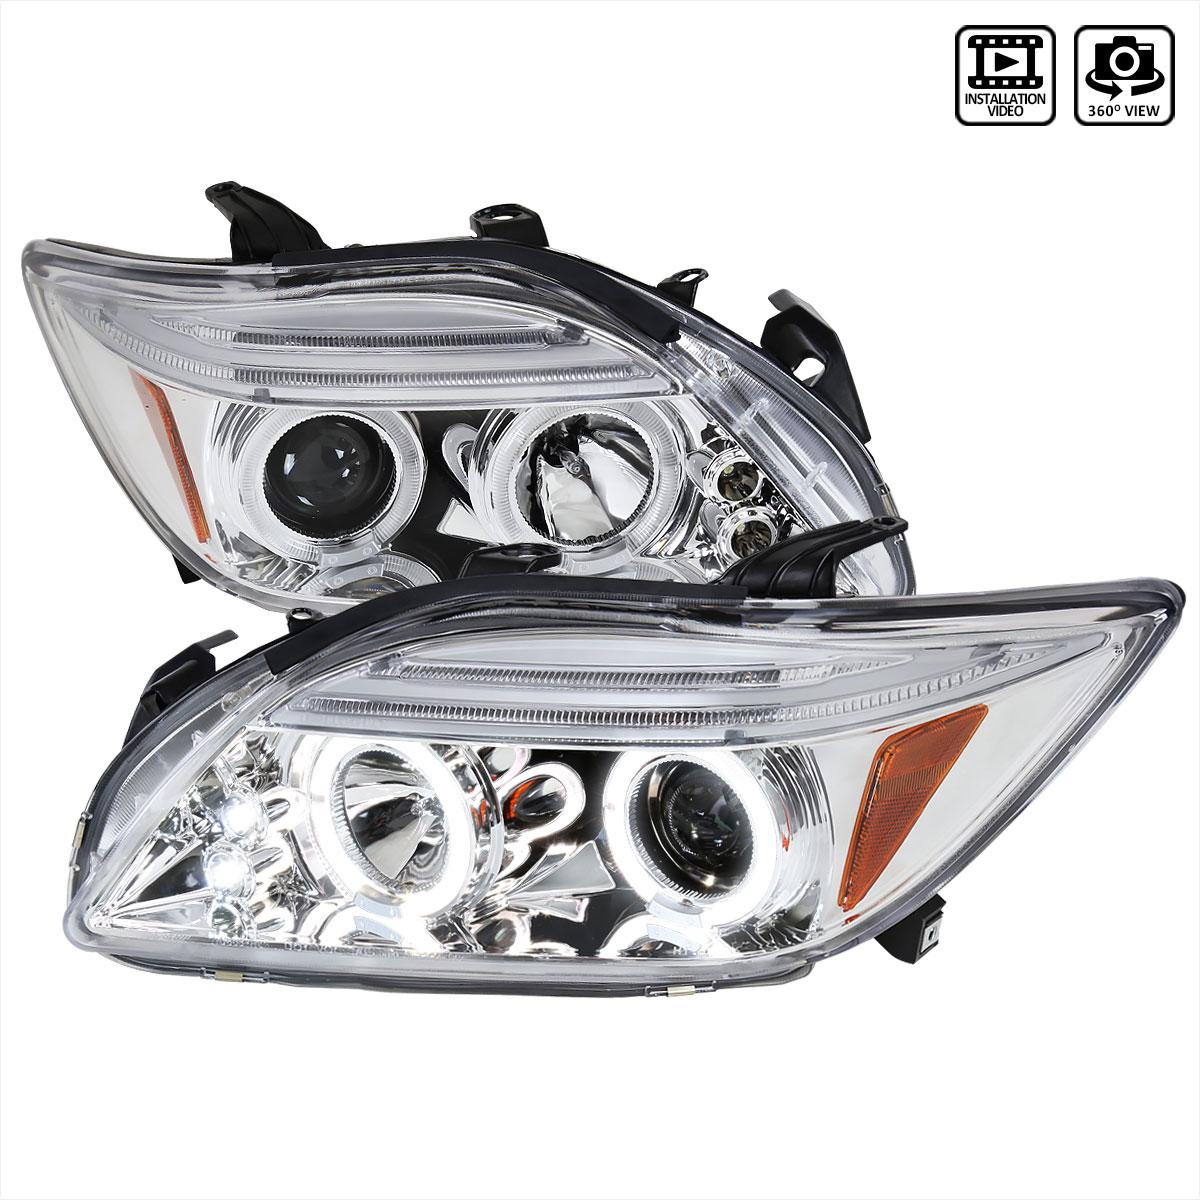 Spec-D Tuning 2LHP-TC05-TM - Spec-D 04-06 Scion Tc Halo Projector Headlights